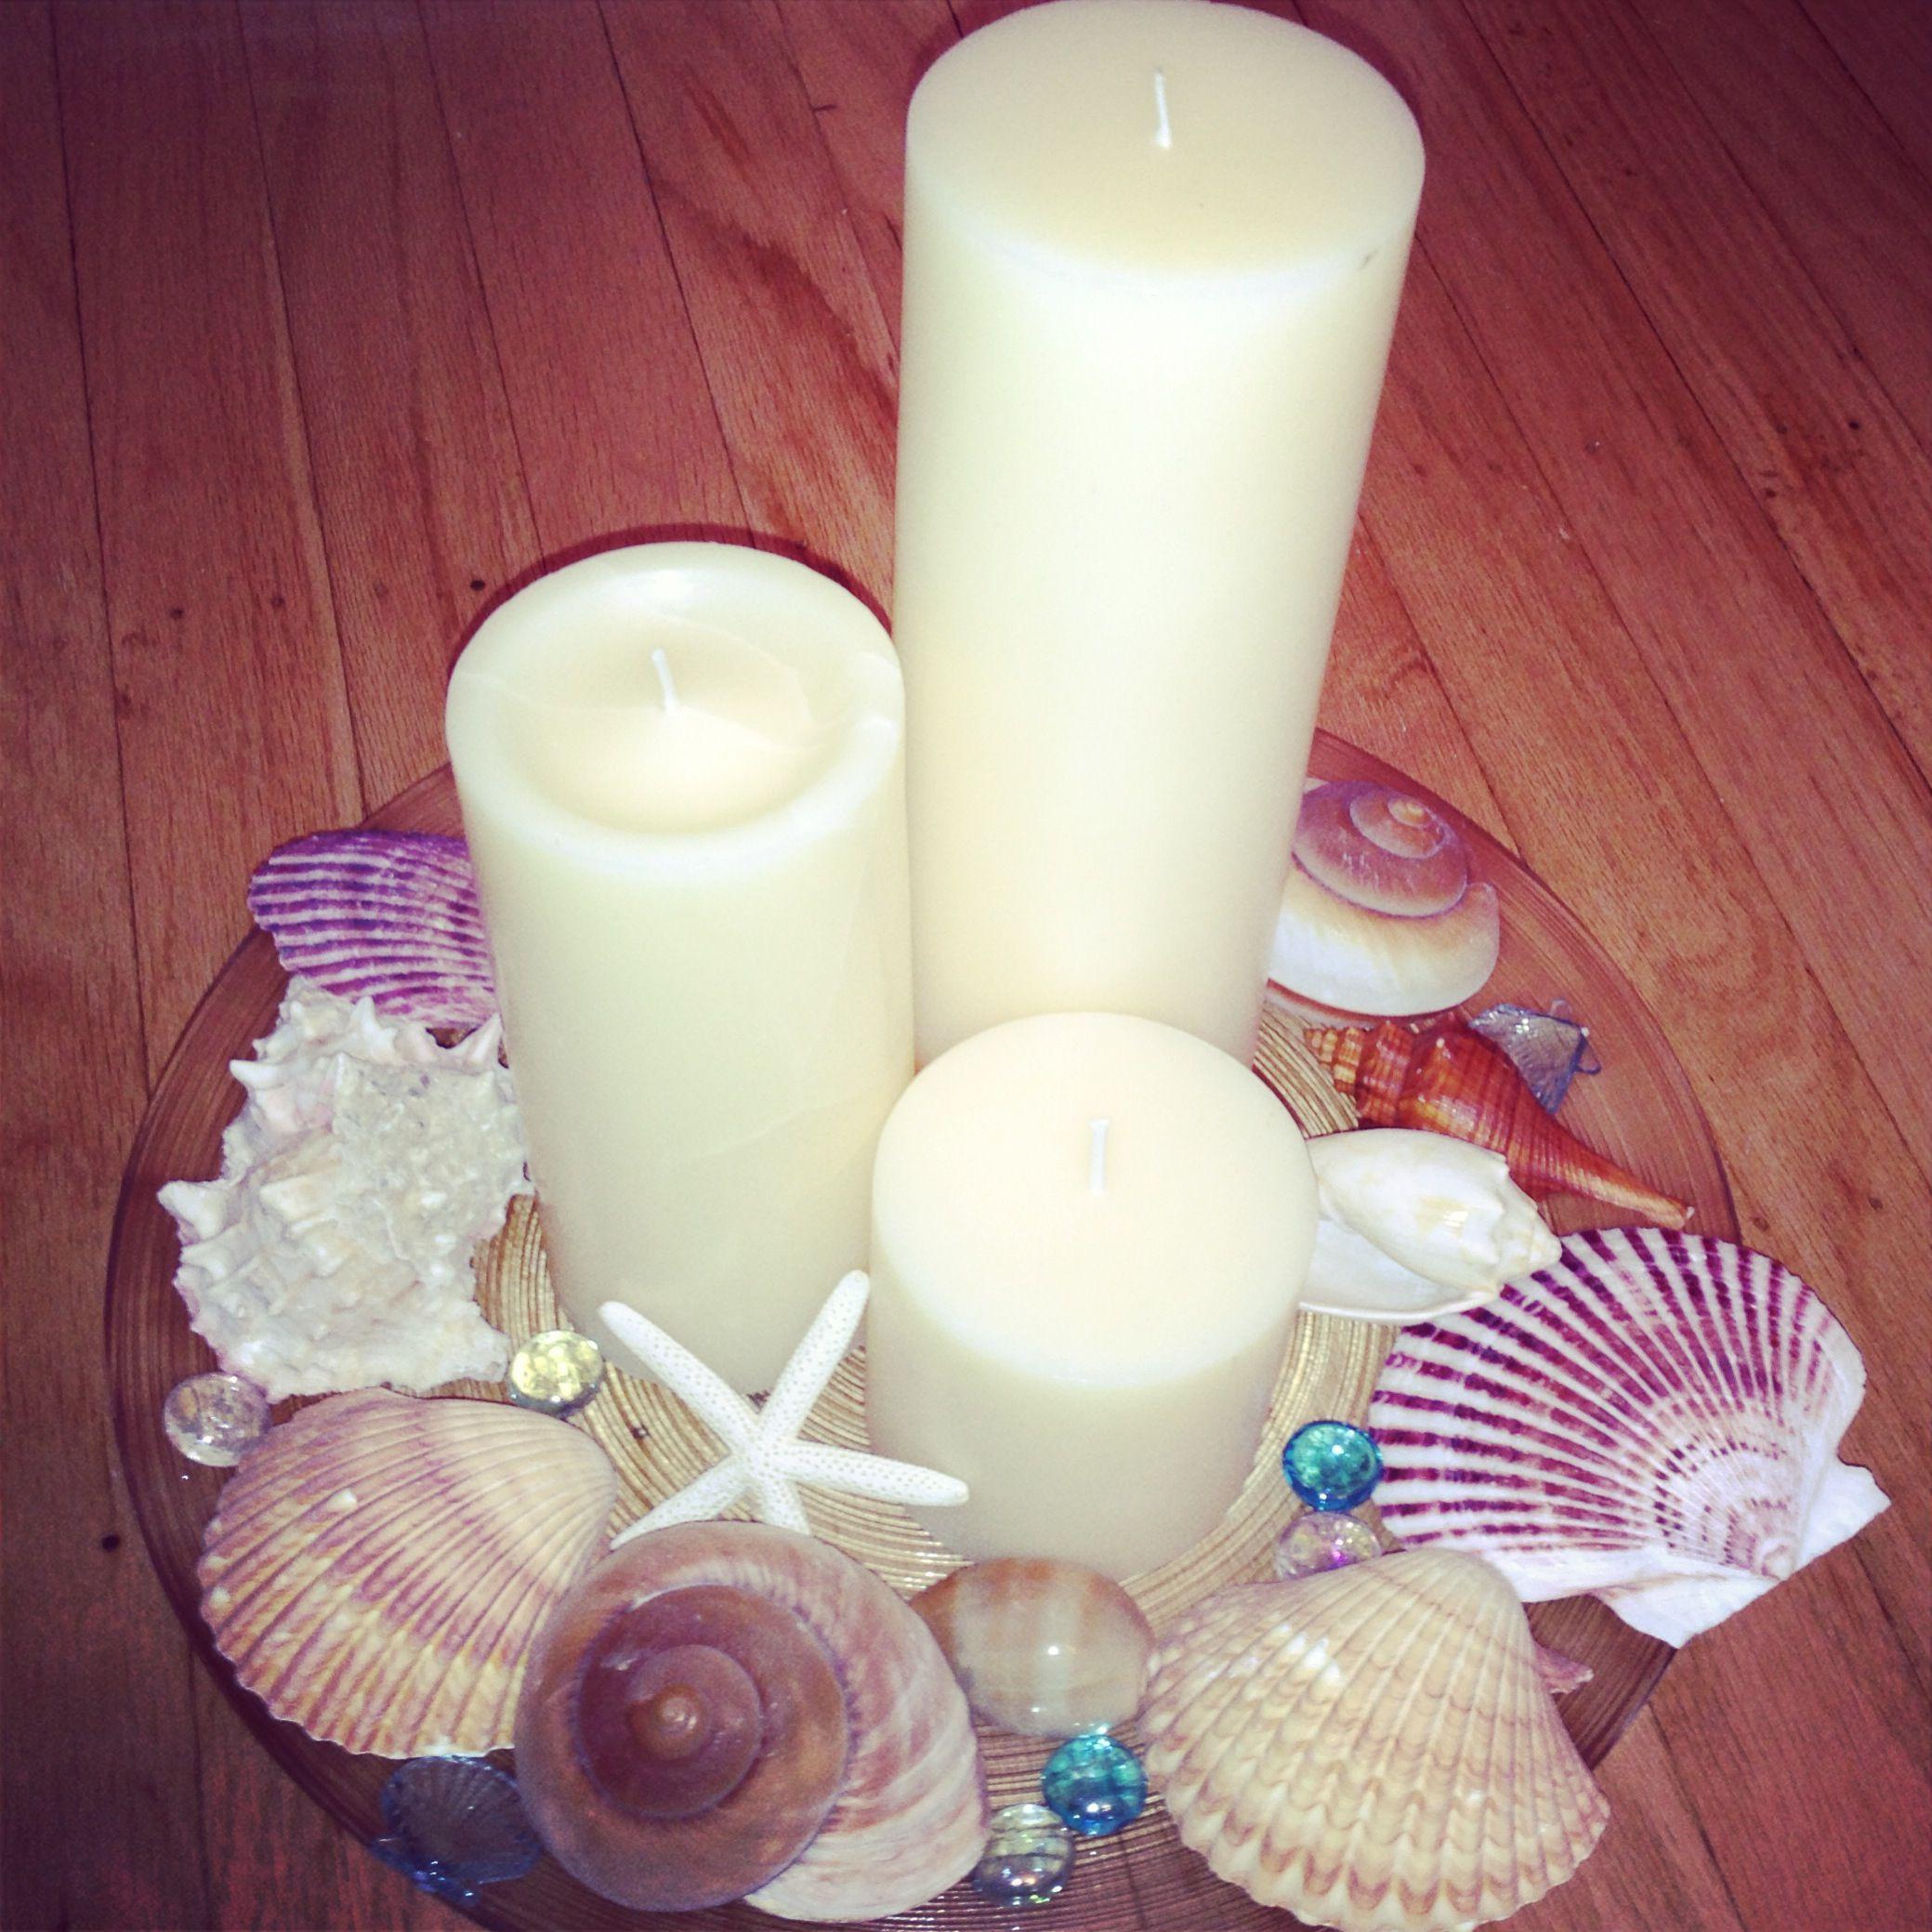 Beach wedding centerpieces - candles and seashells